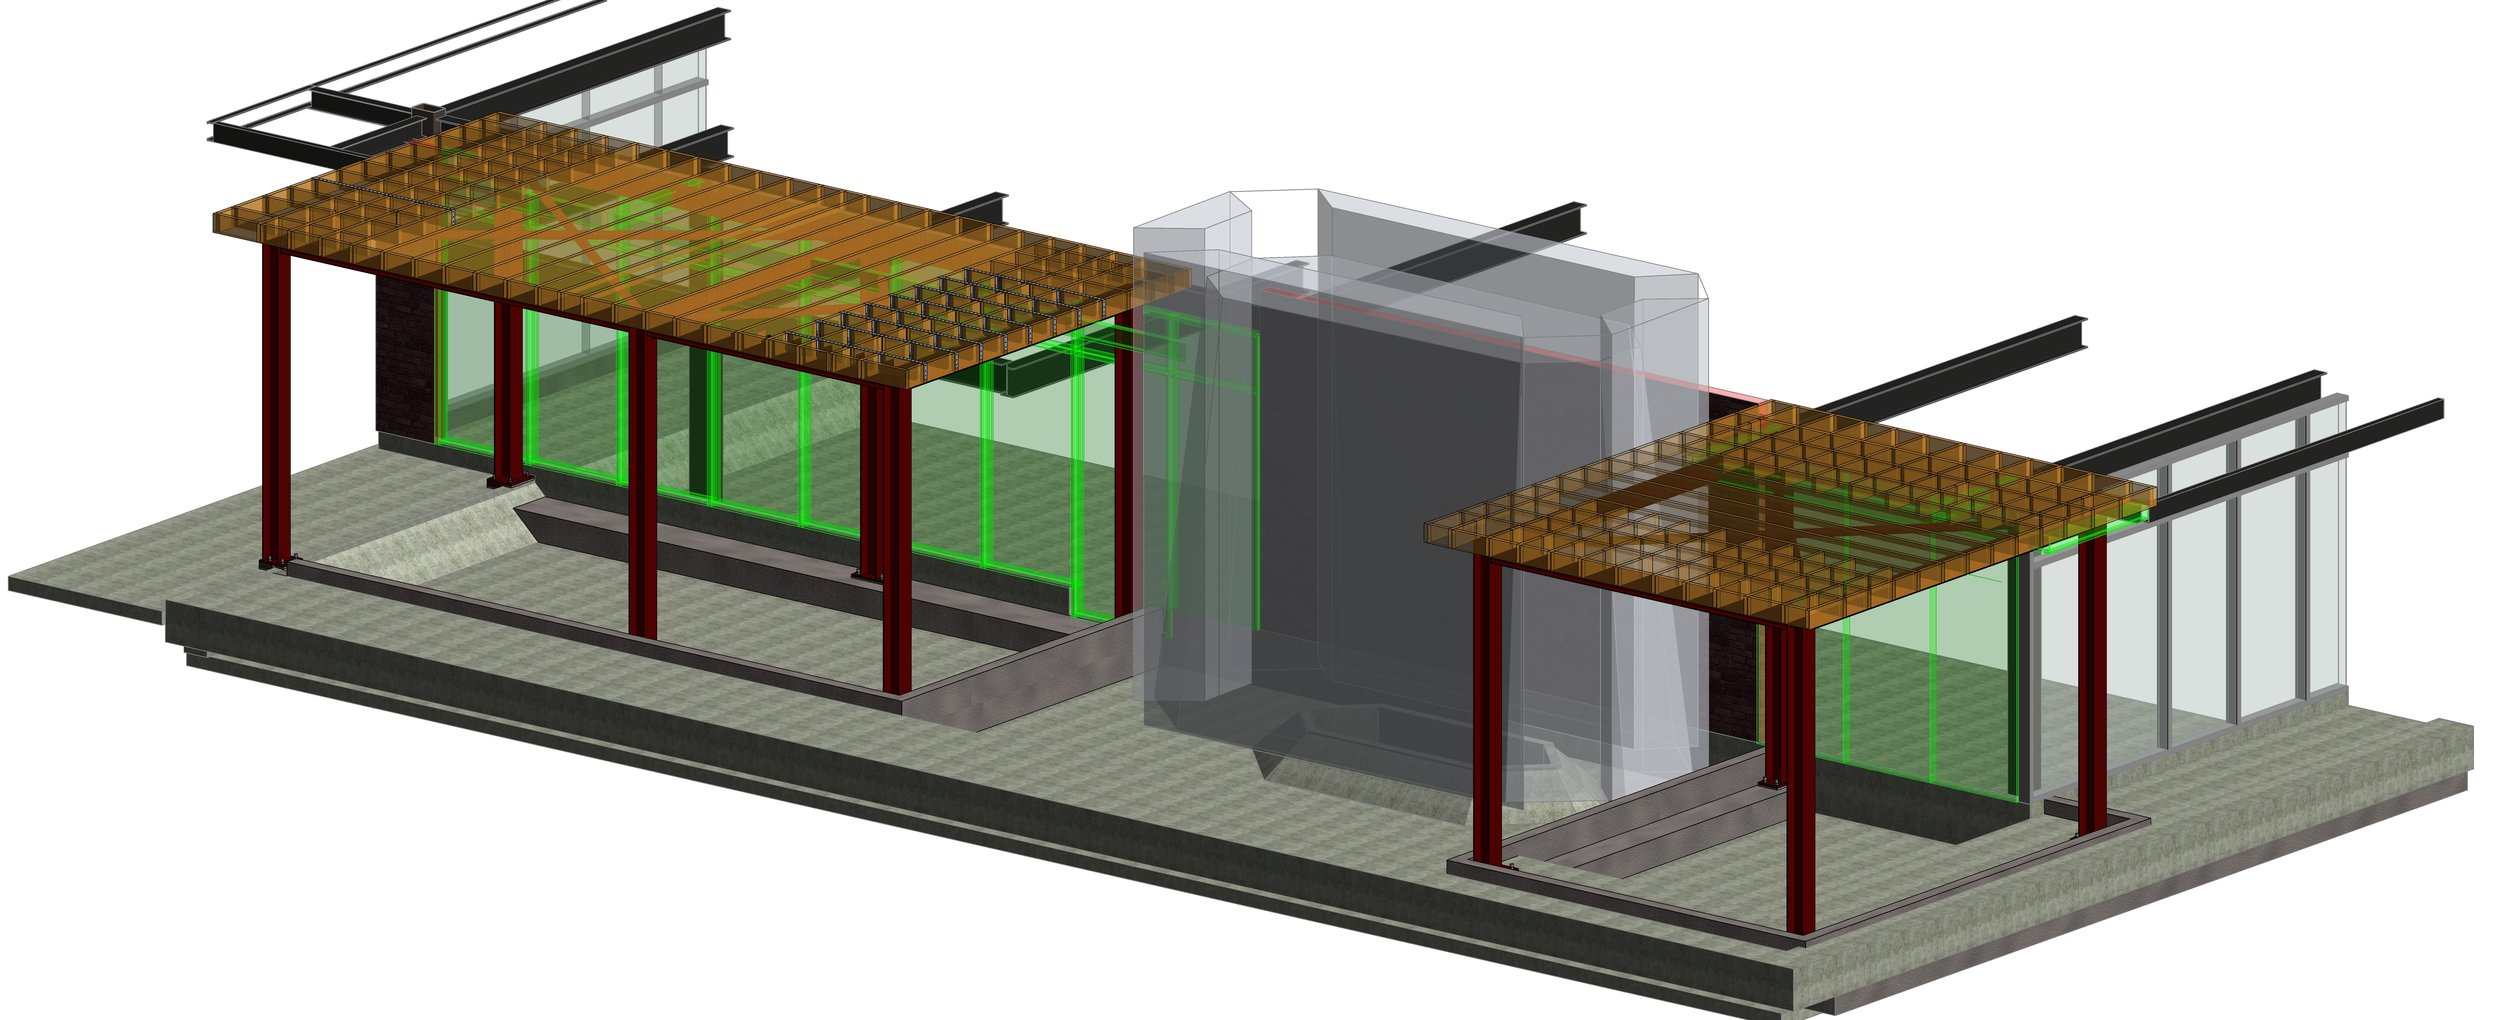 ENG-DWG-VED-VC0503 - 3D View - 3D View Copy 1.jpg